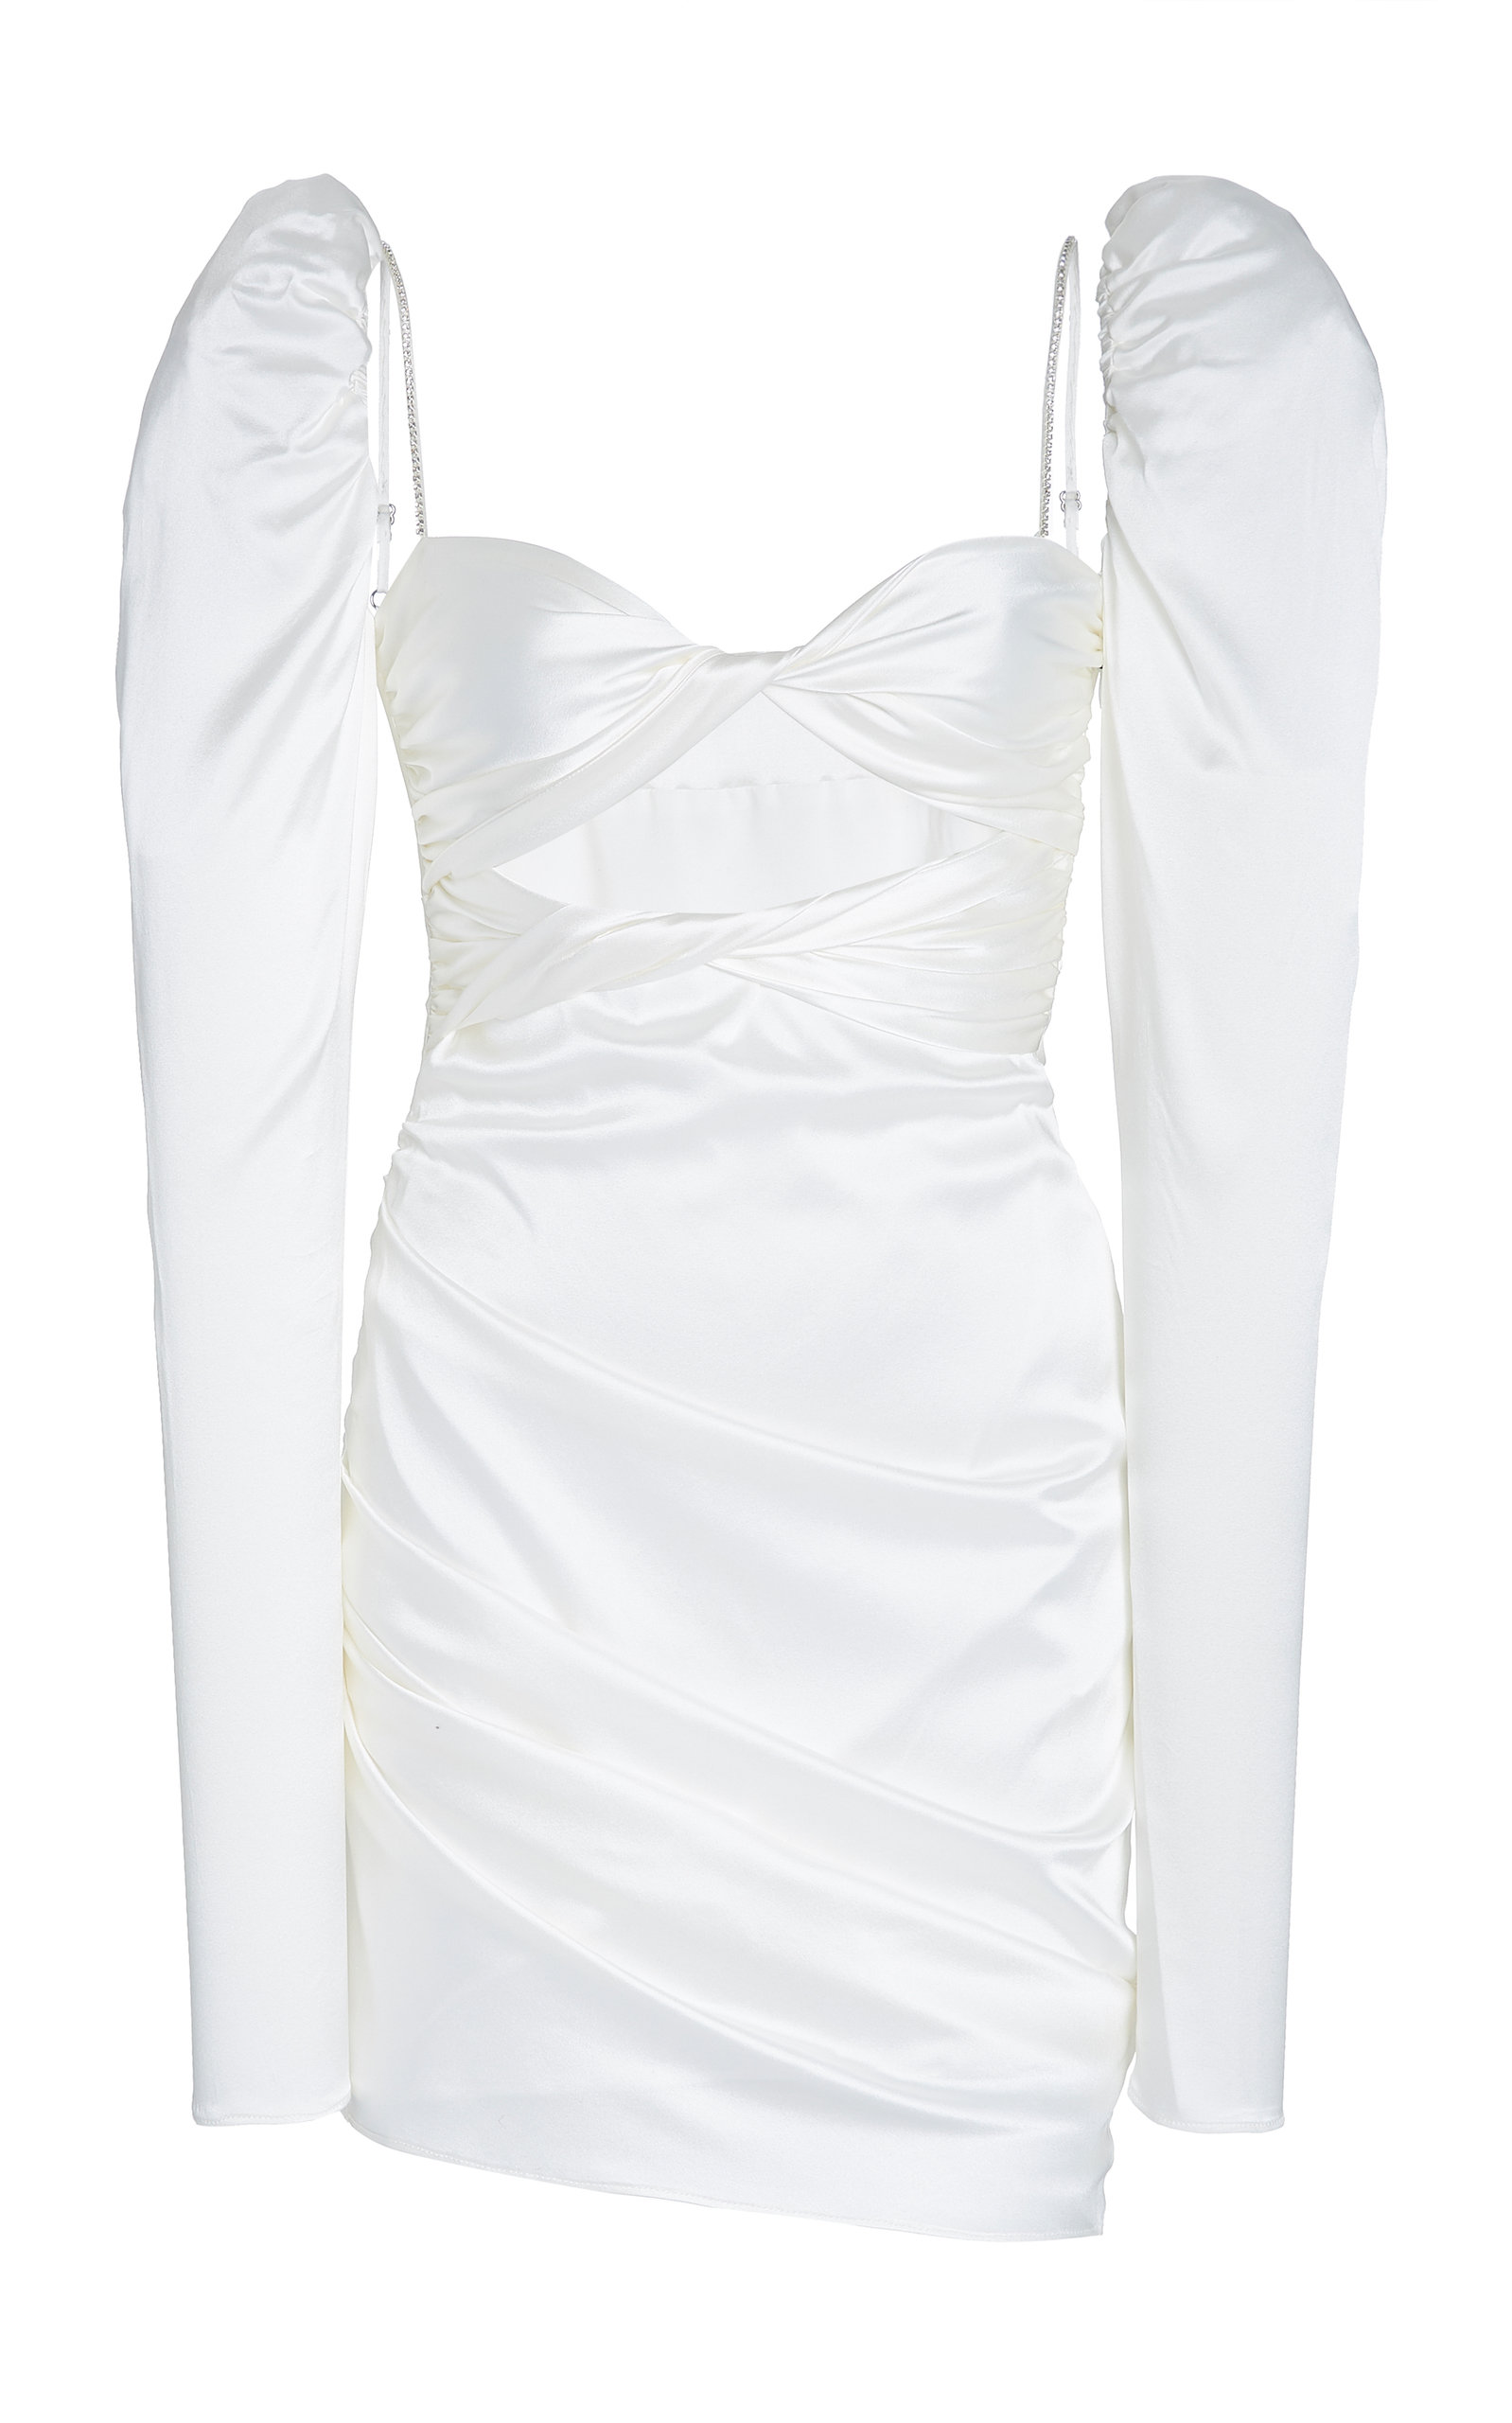 Pmd Dresses LONG SLEEVE TWIST TOP DRESS